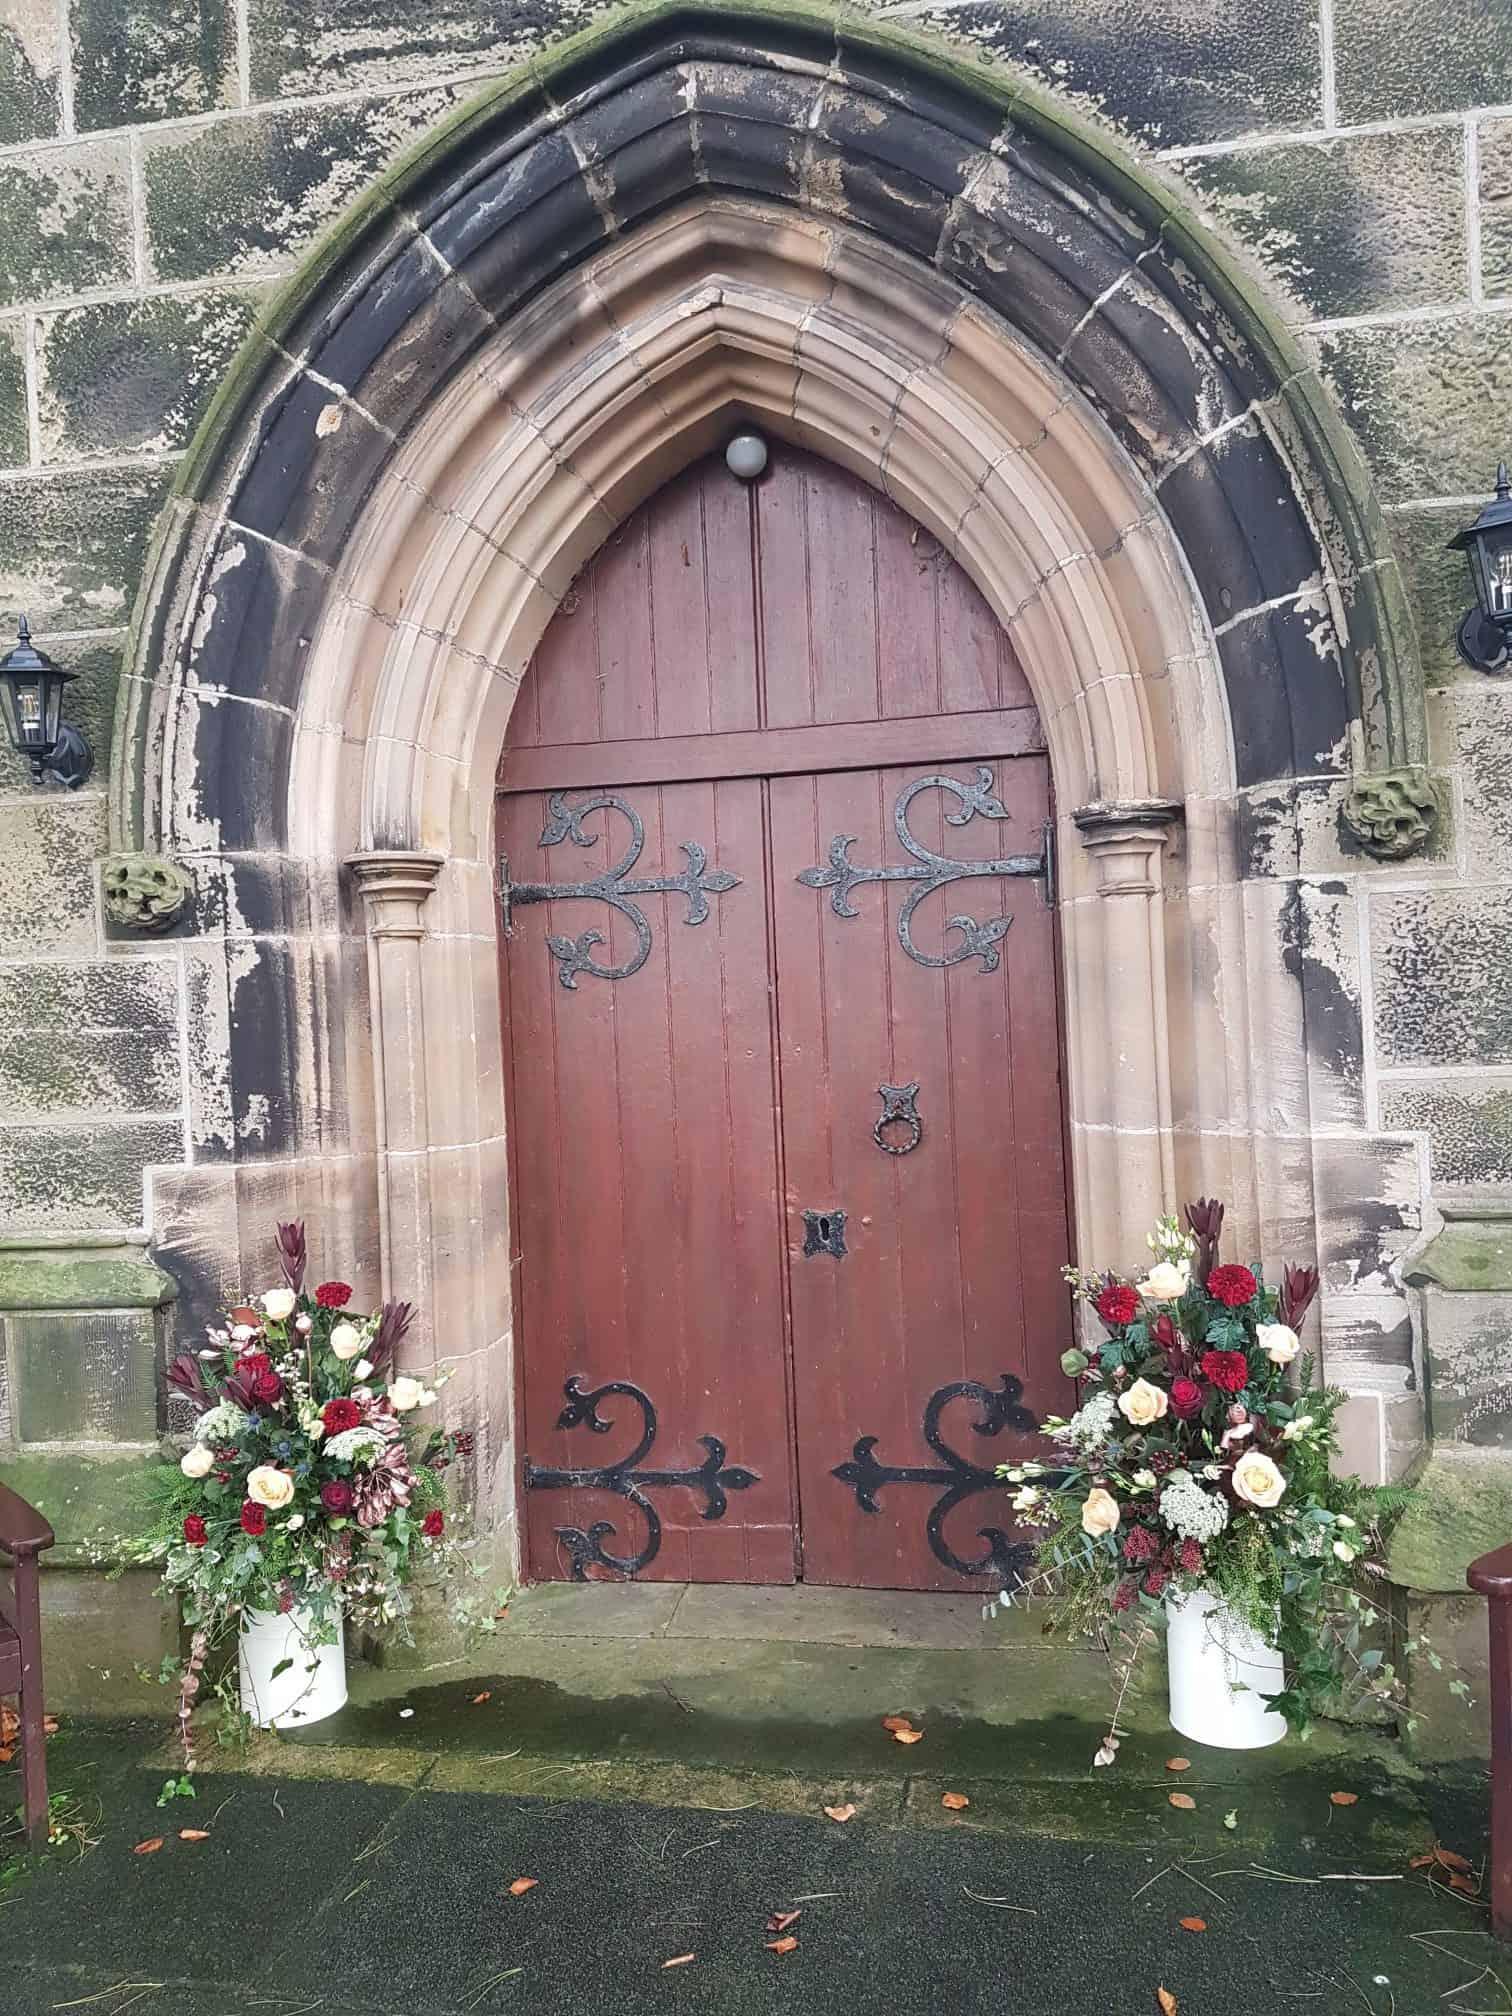 Flowers beside the church entrance - milk churns